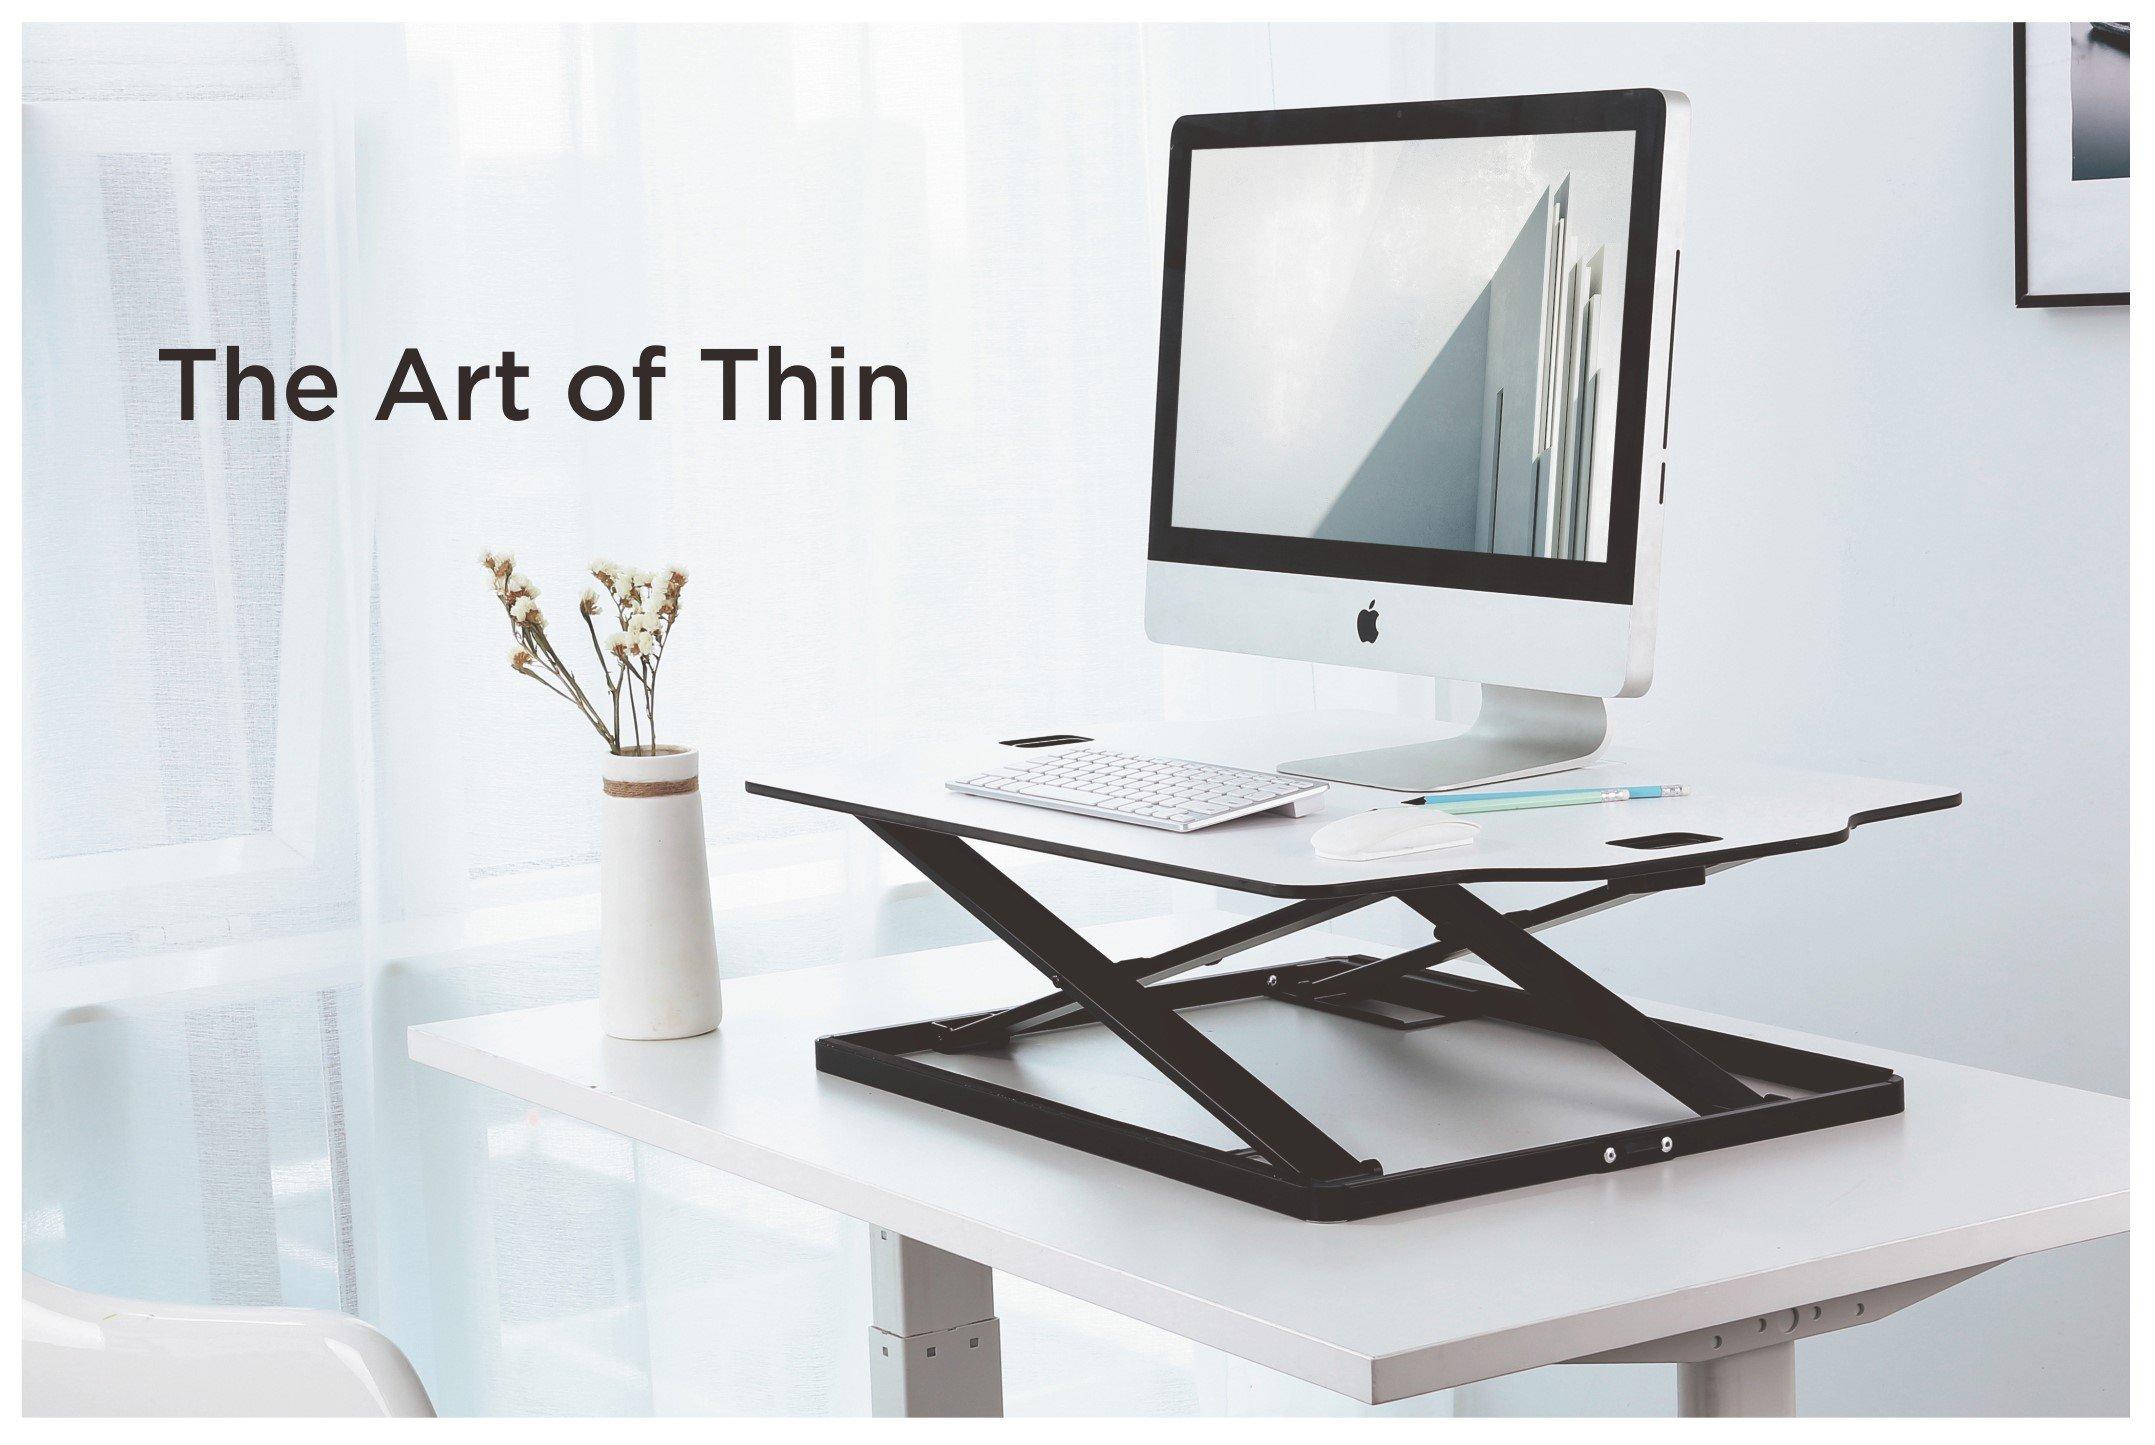 Amer EZUP 32x22 Height Adjustable Sit/Stand Desk Surface Riser, 32'' wide Tabletop Sit Stand Desk Converter, Monitor Laptop Platform Work Station - Durable White Top